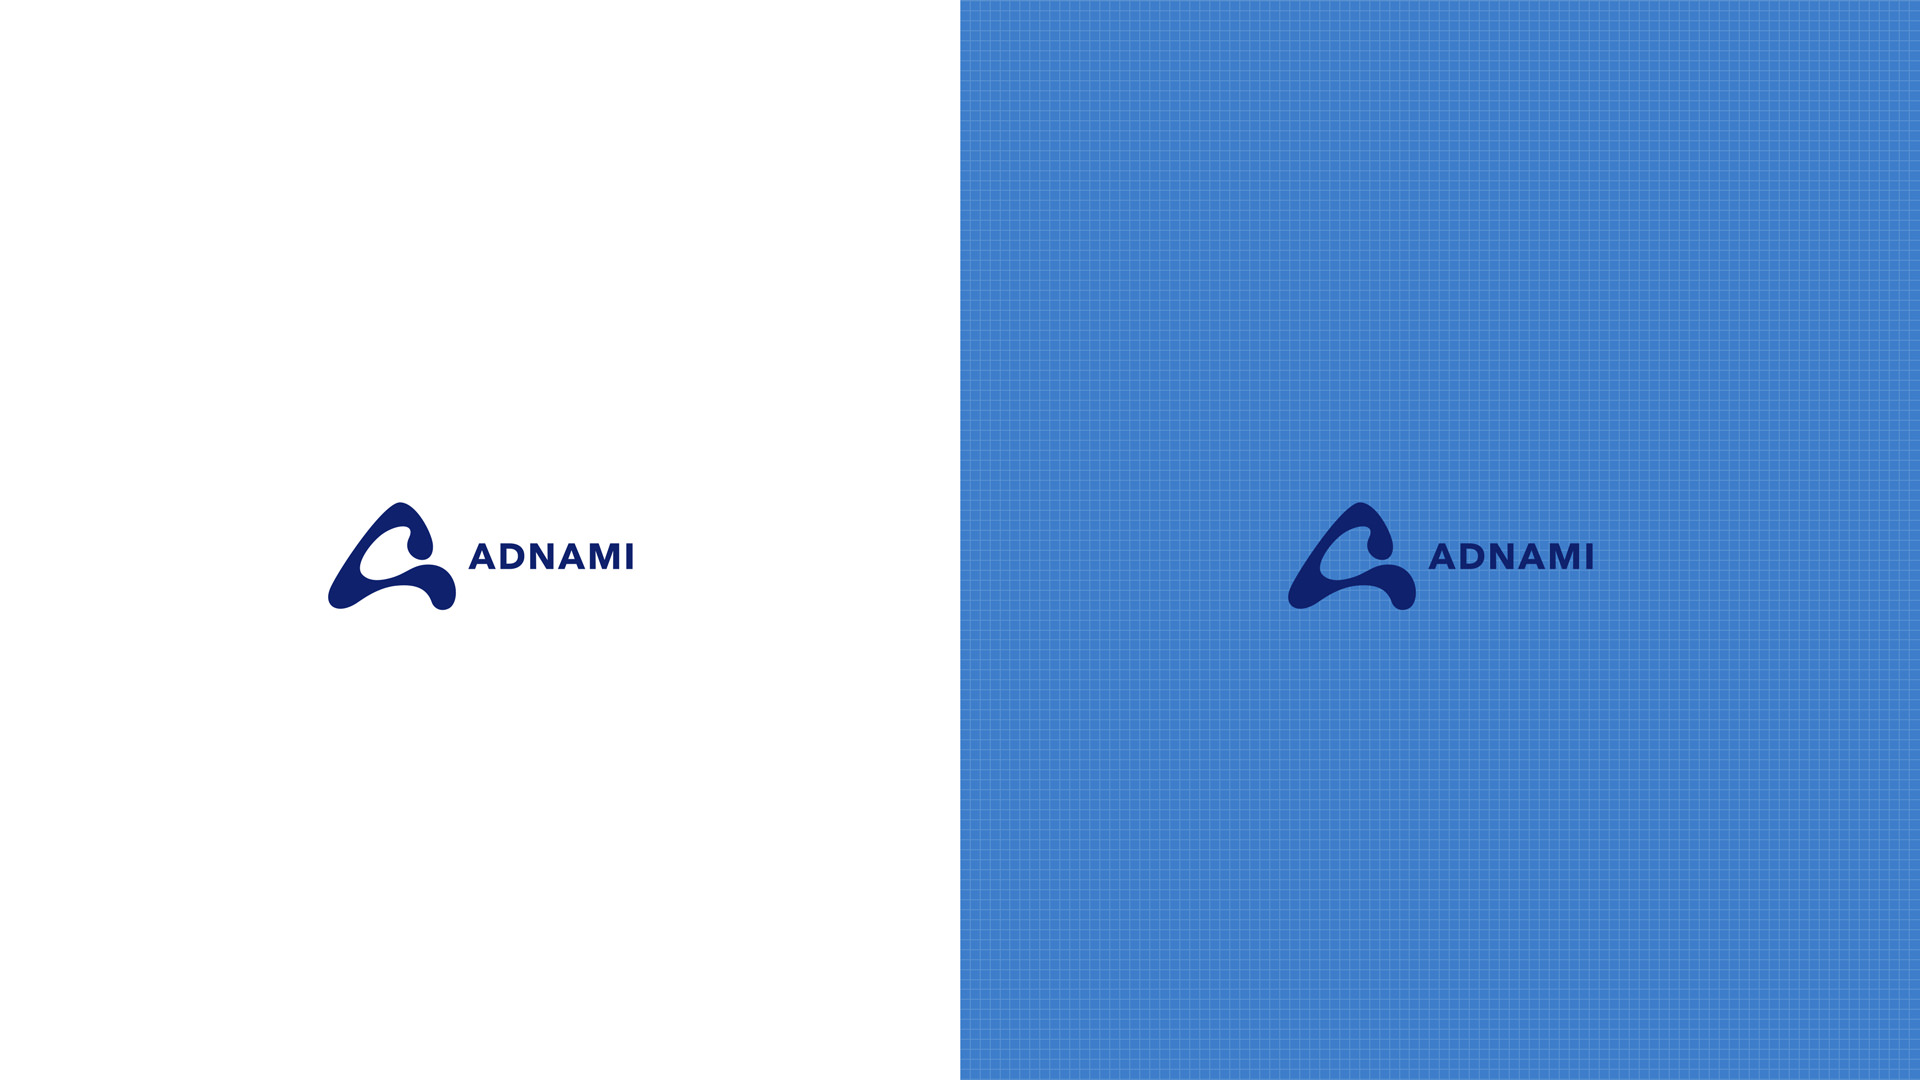 adnami_21